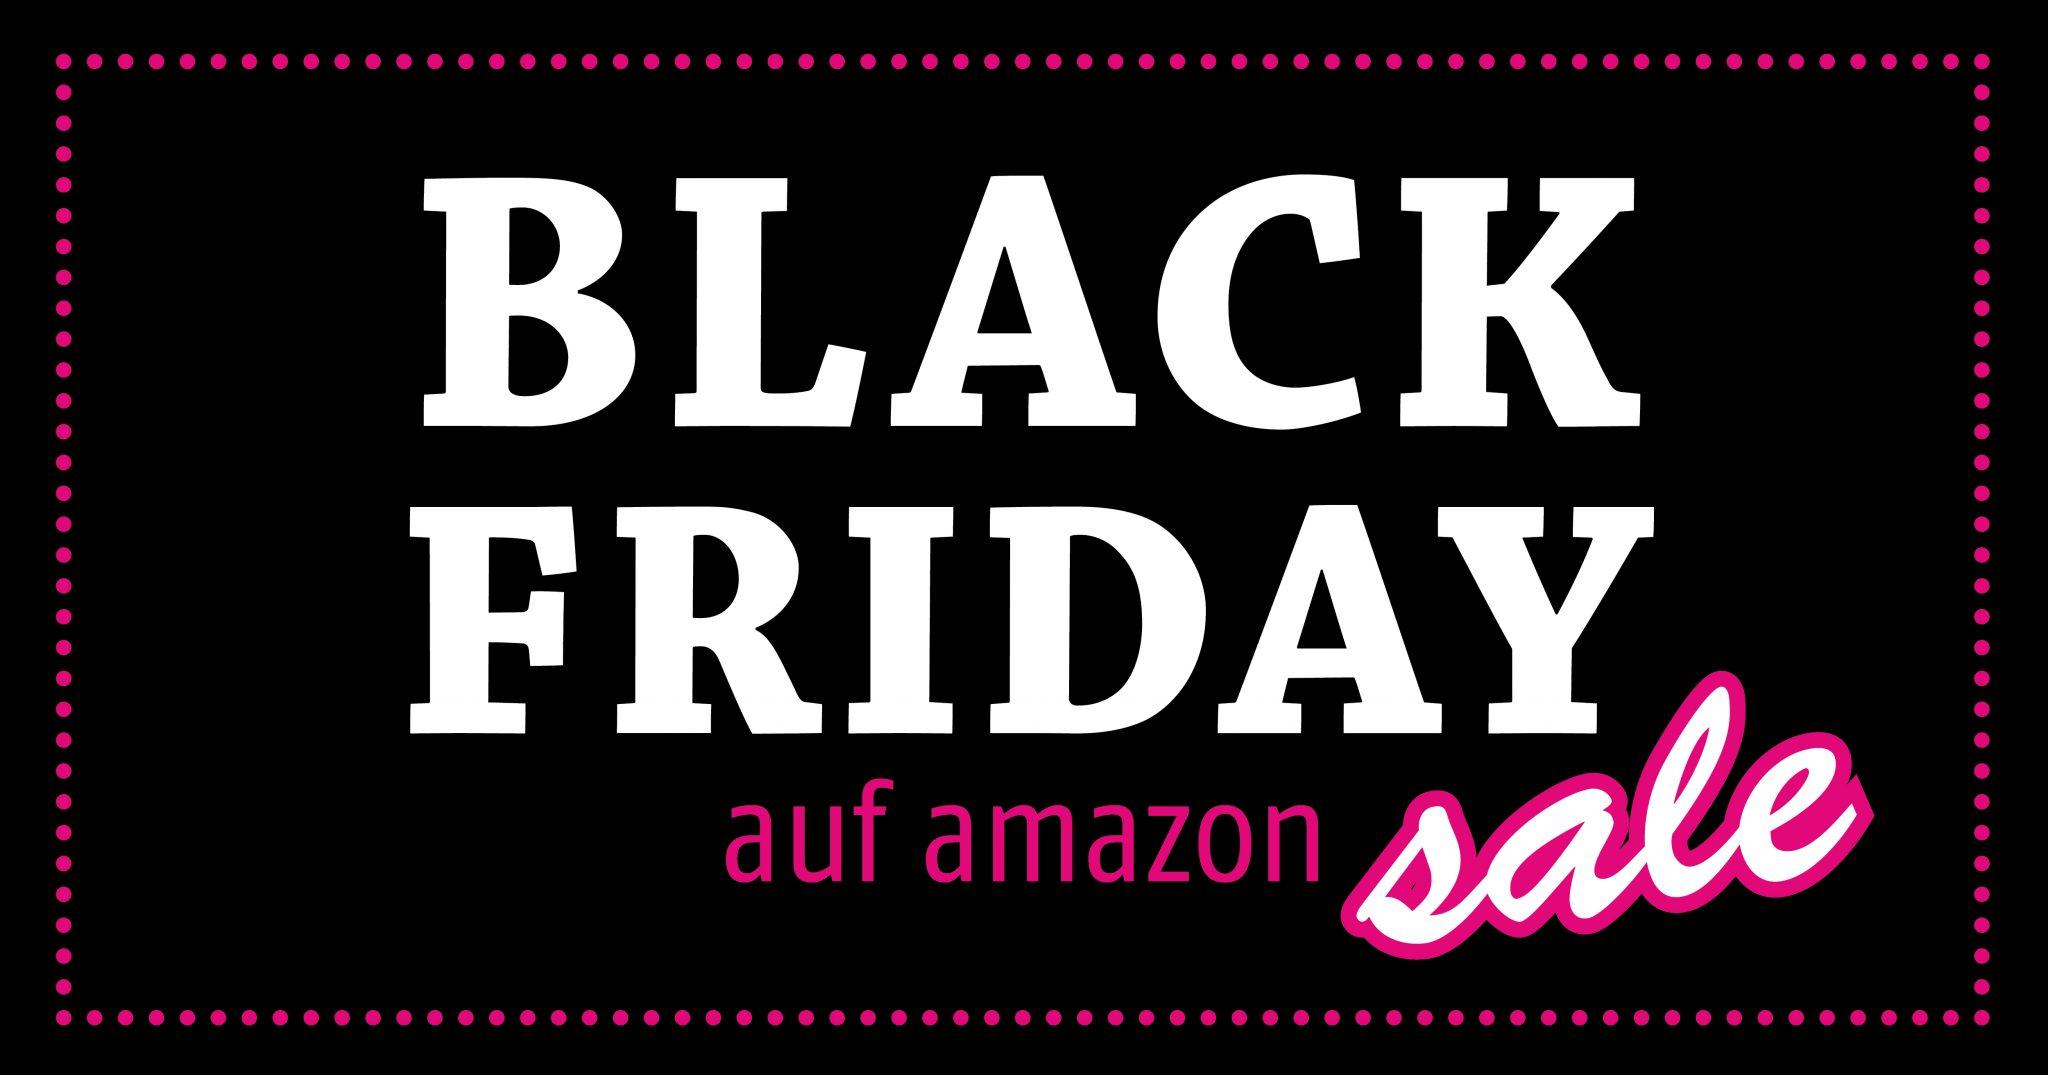 Black Friday Angebote Apple Black Friday 2015 Angebote Im Berblick Mac Life Black Friday